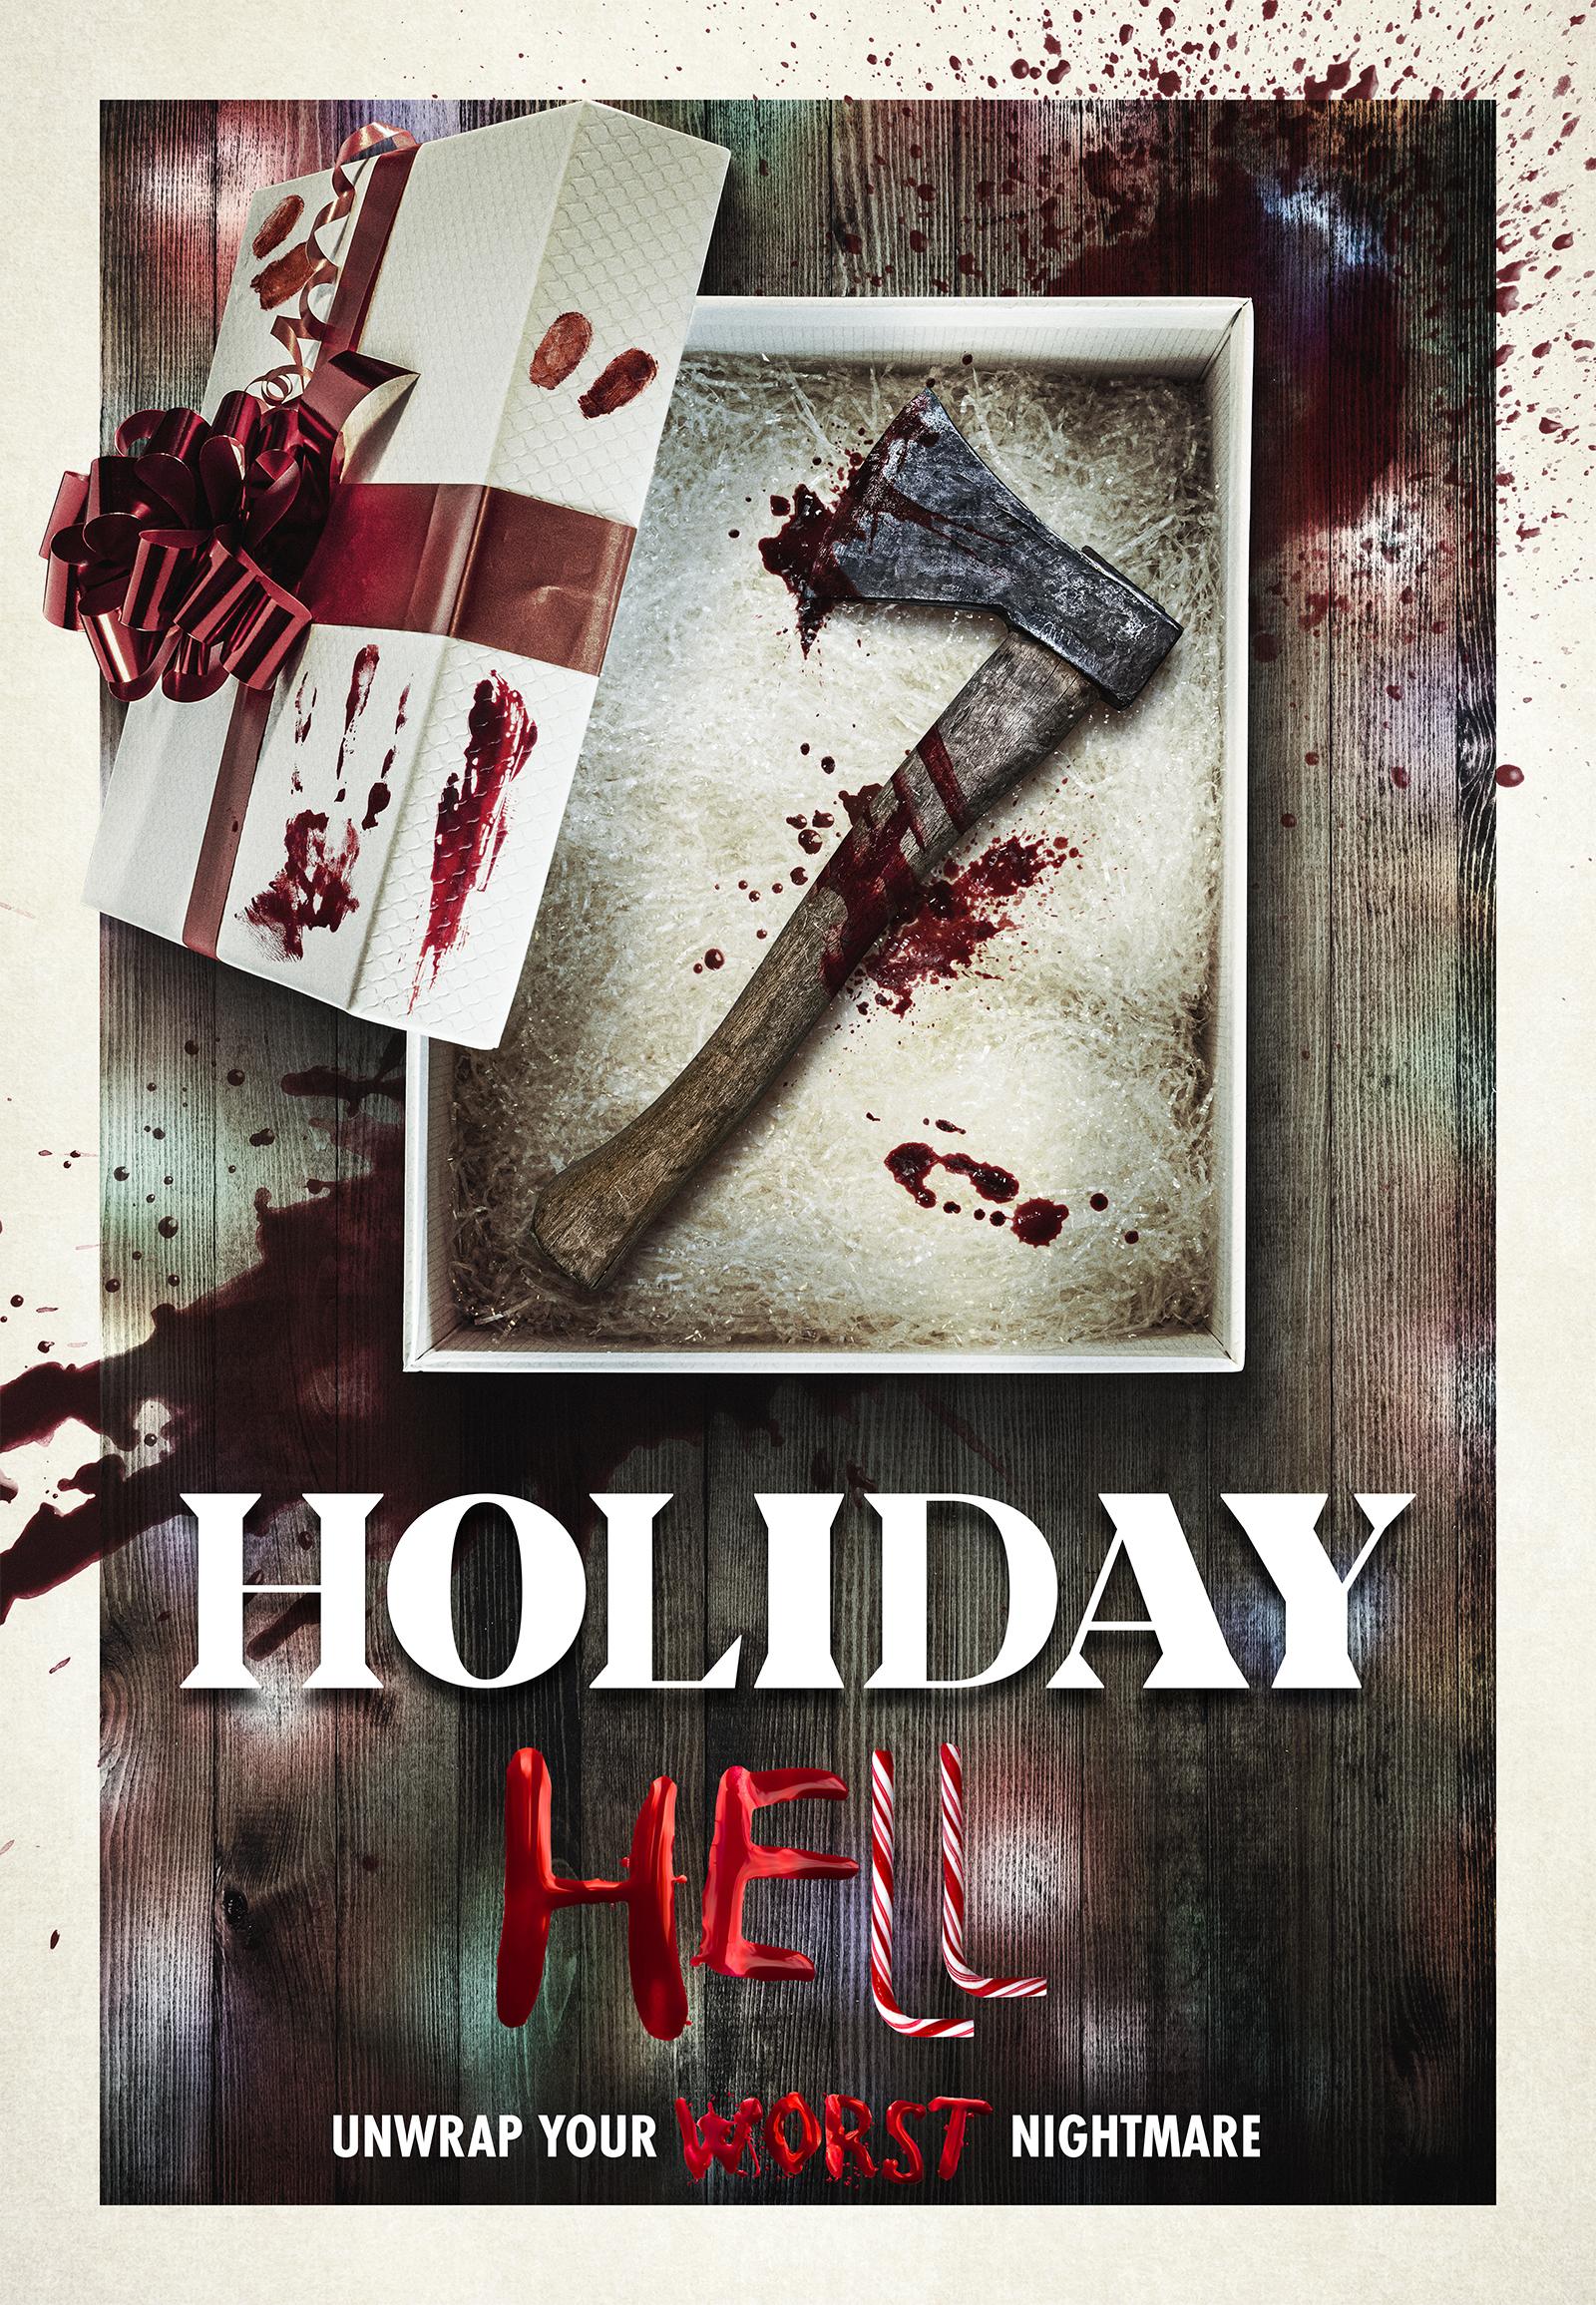 Holiday_Hell_FINAL_1.jpg?1563298164